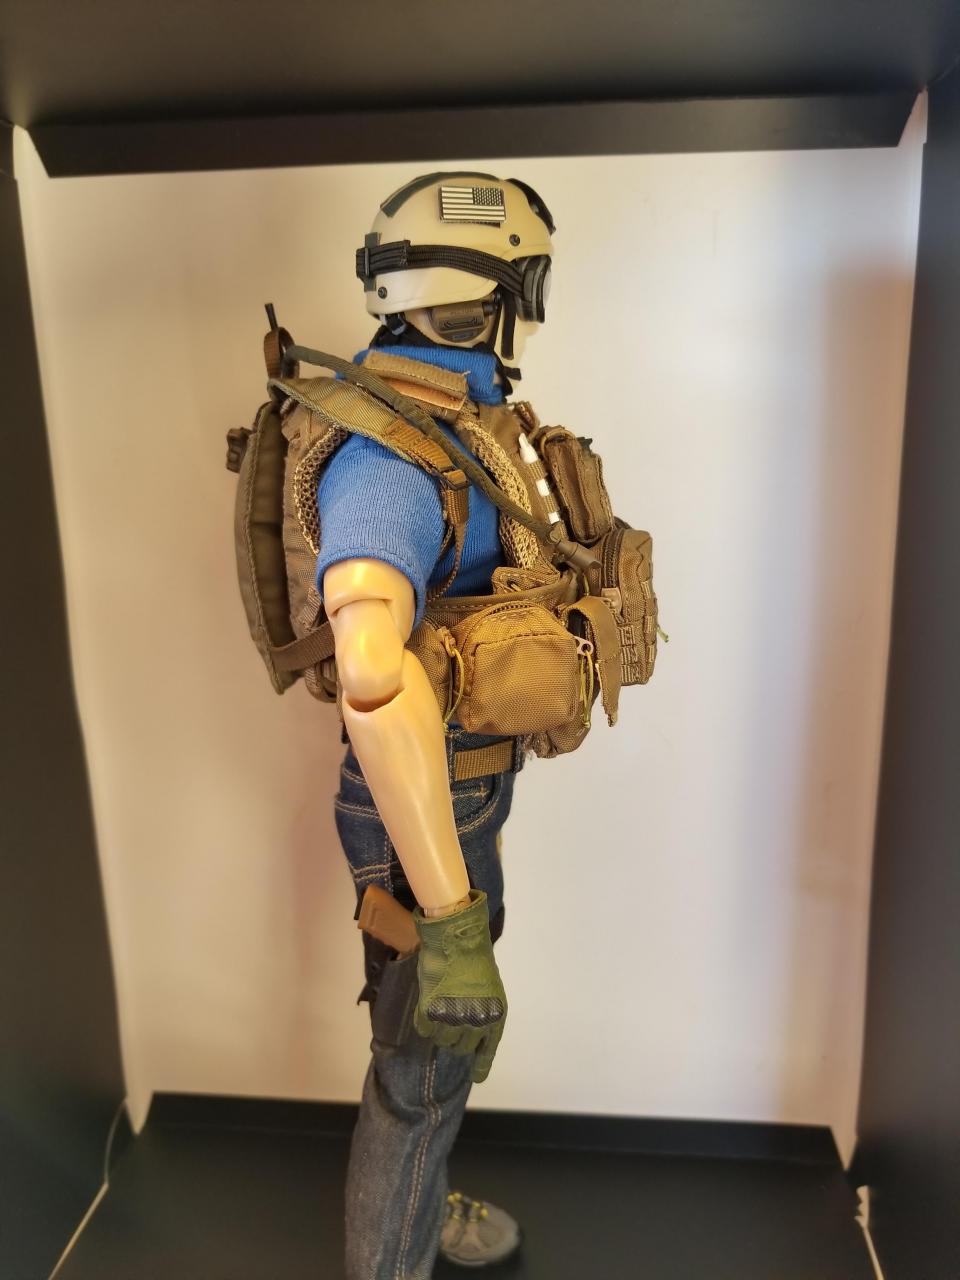 Modern Warfare 2 - Task Force 141 operative in urban wear (pic heavy)-7_-_n1gmchr[1]-jpg